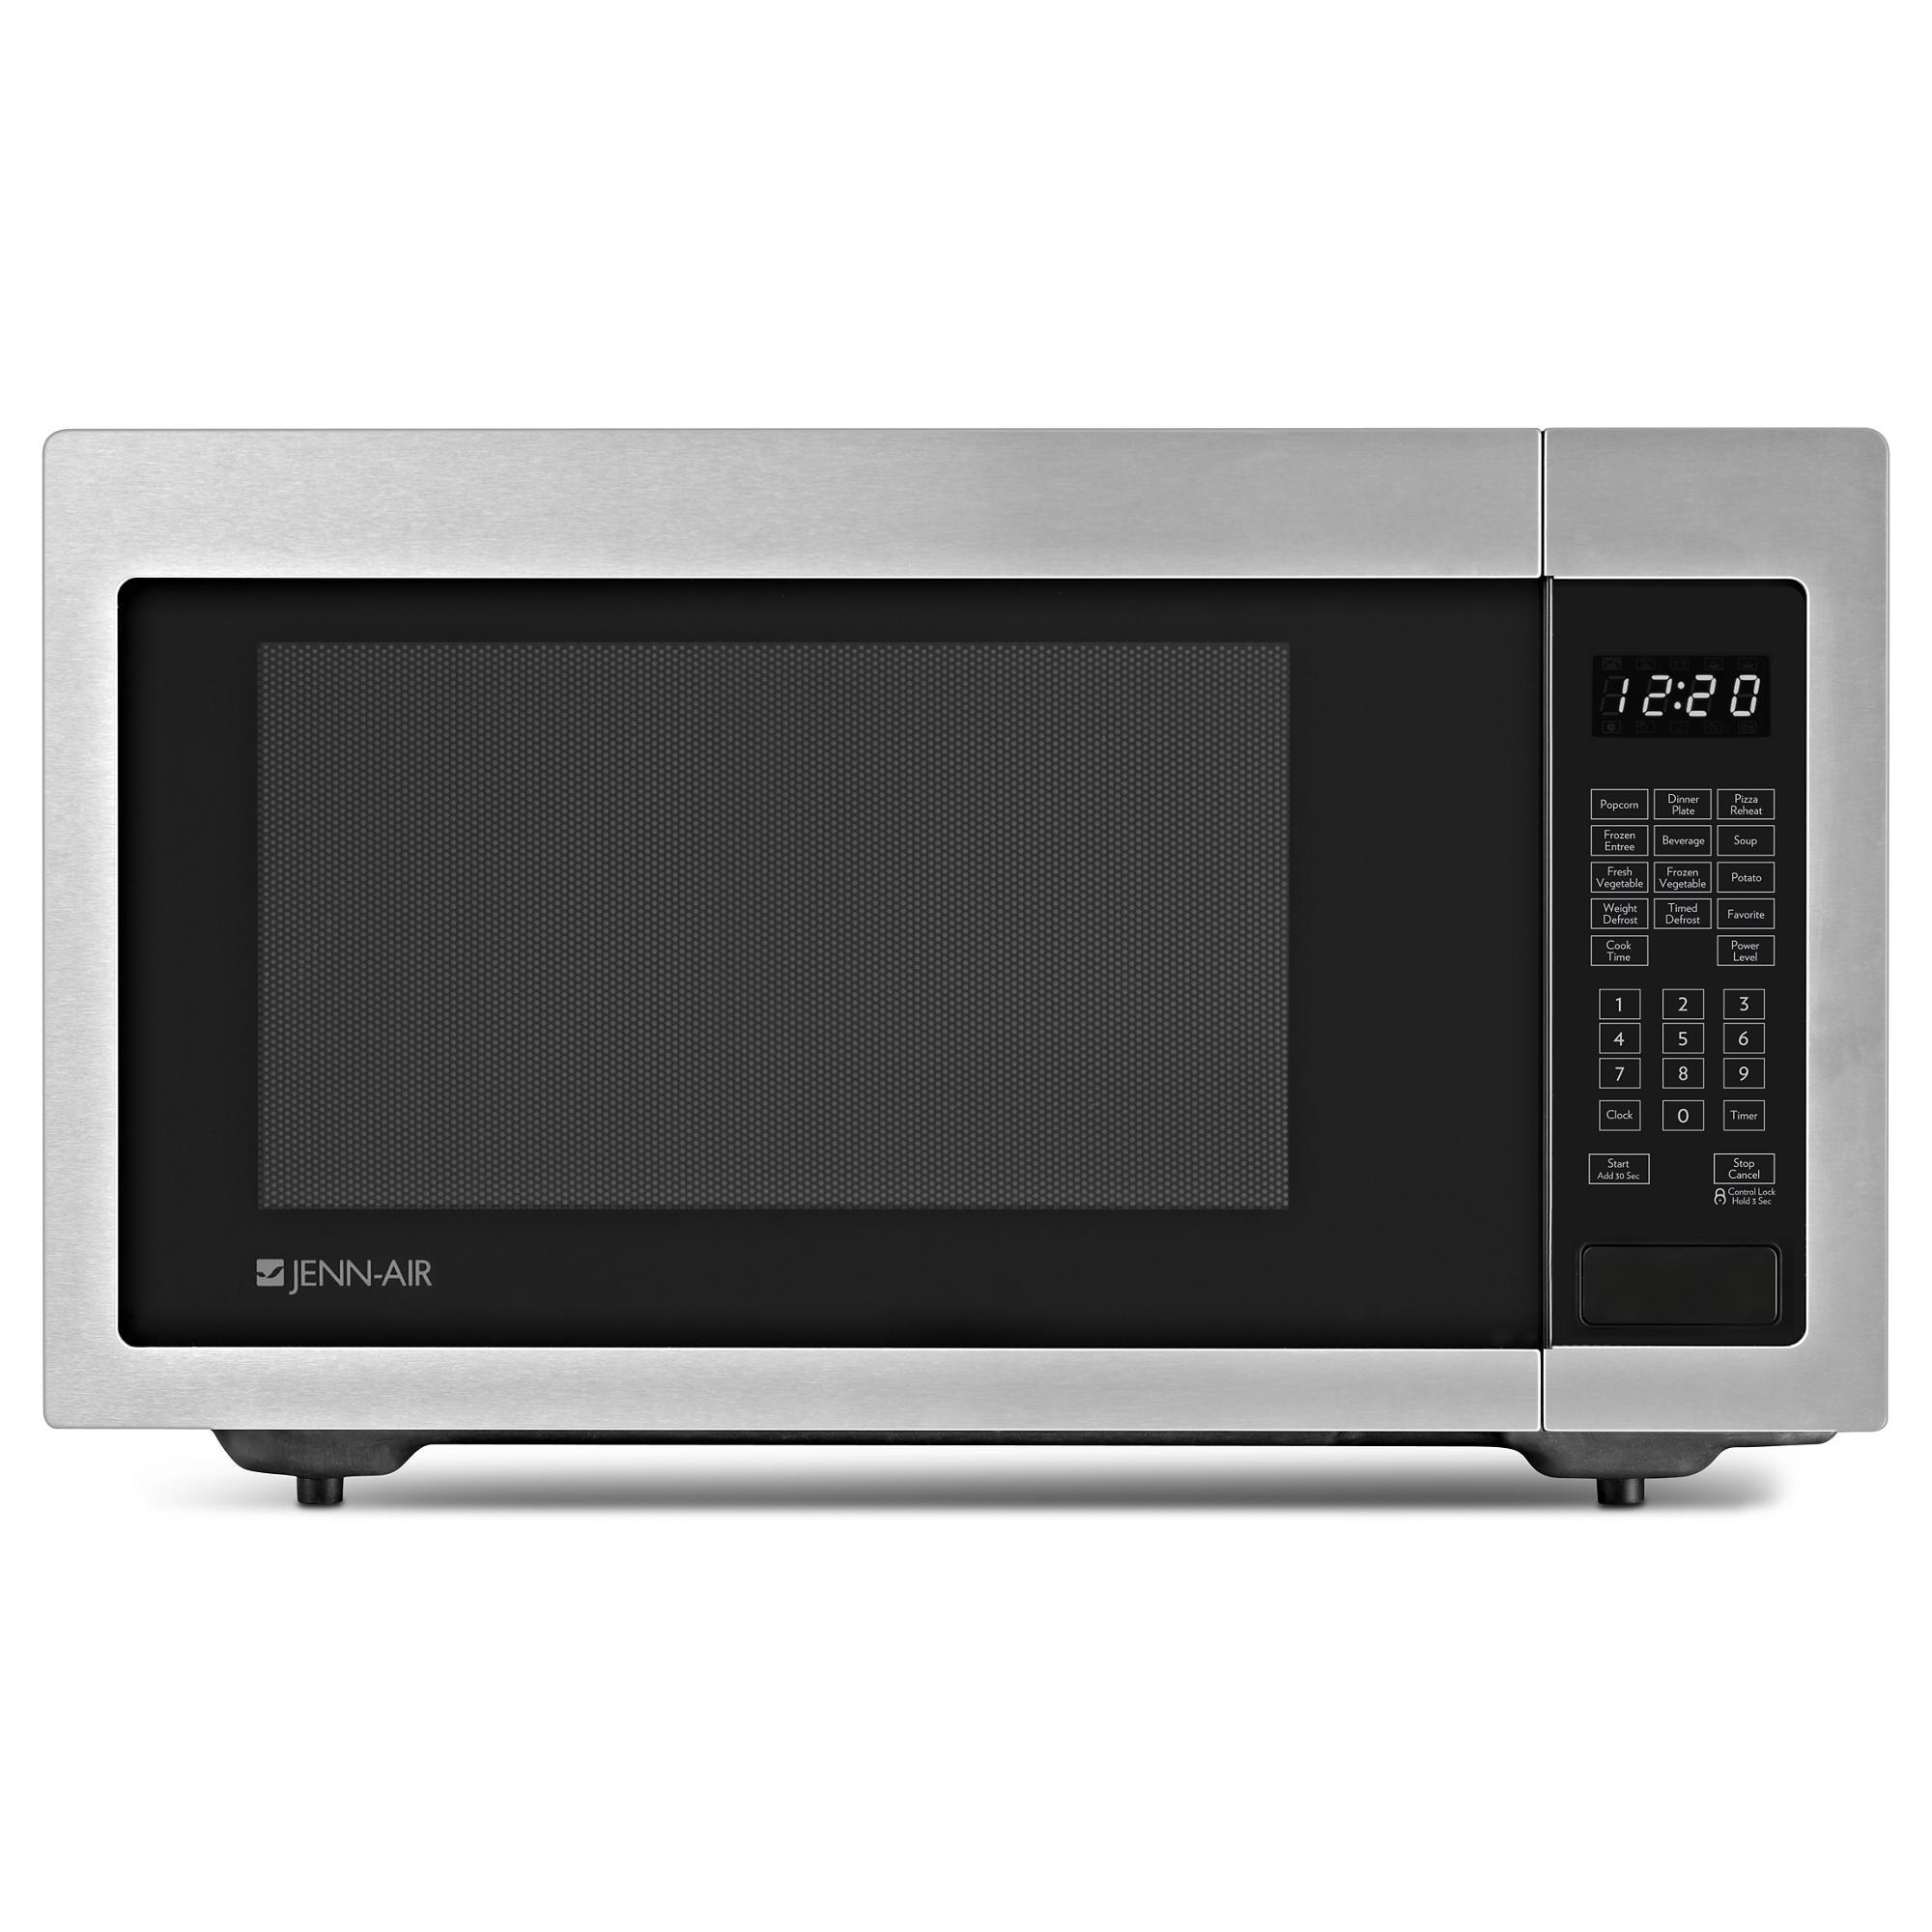 Jmc1116ab Jenn Air Jmc1116ab Built In Microwave Ovens